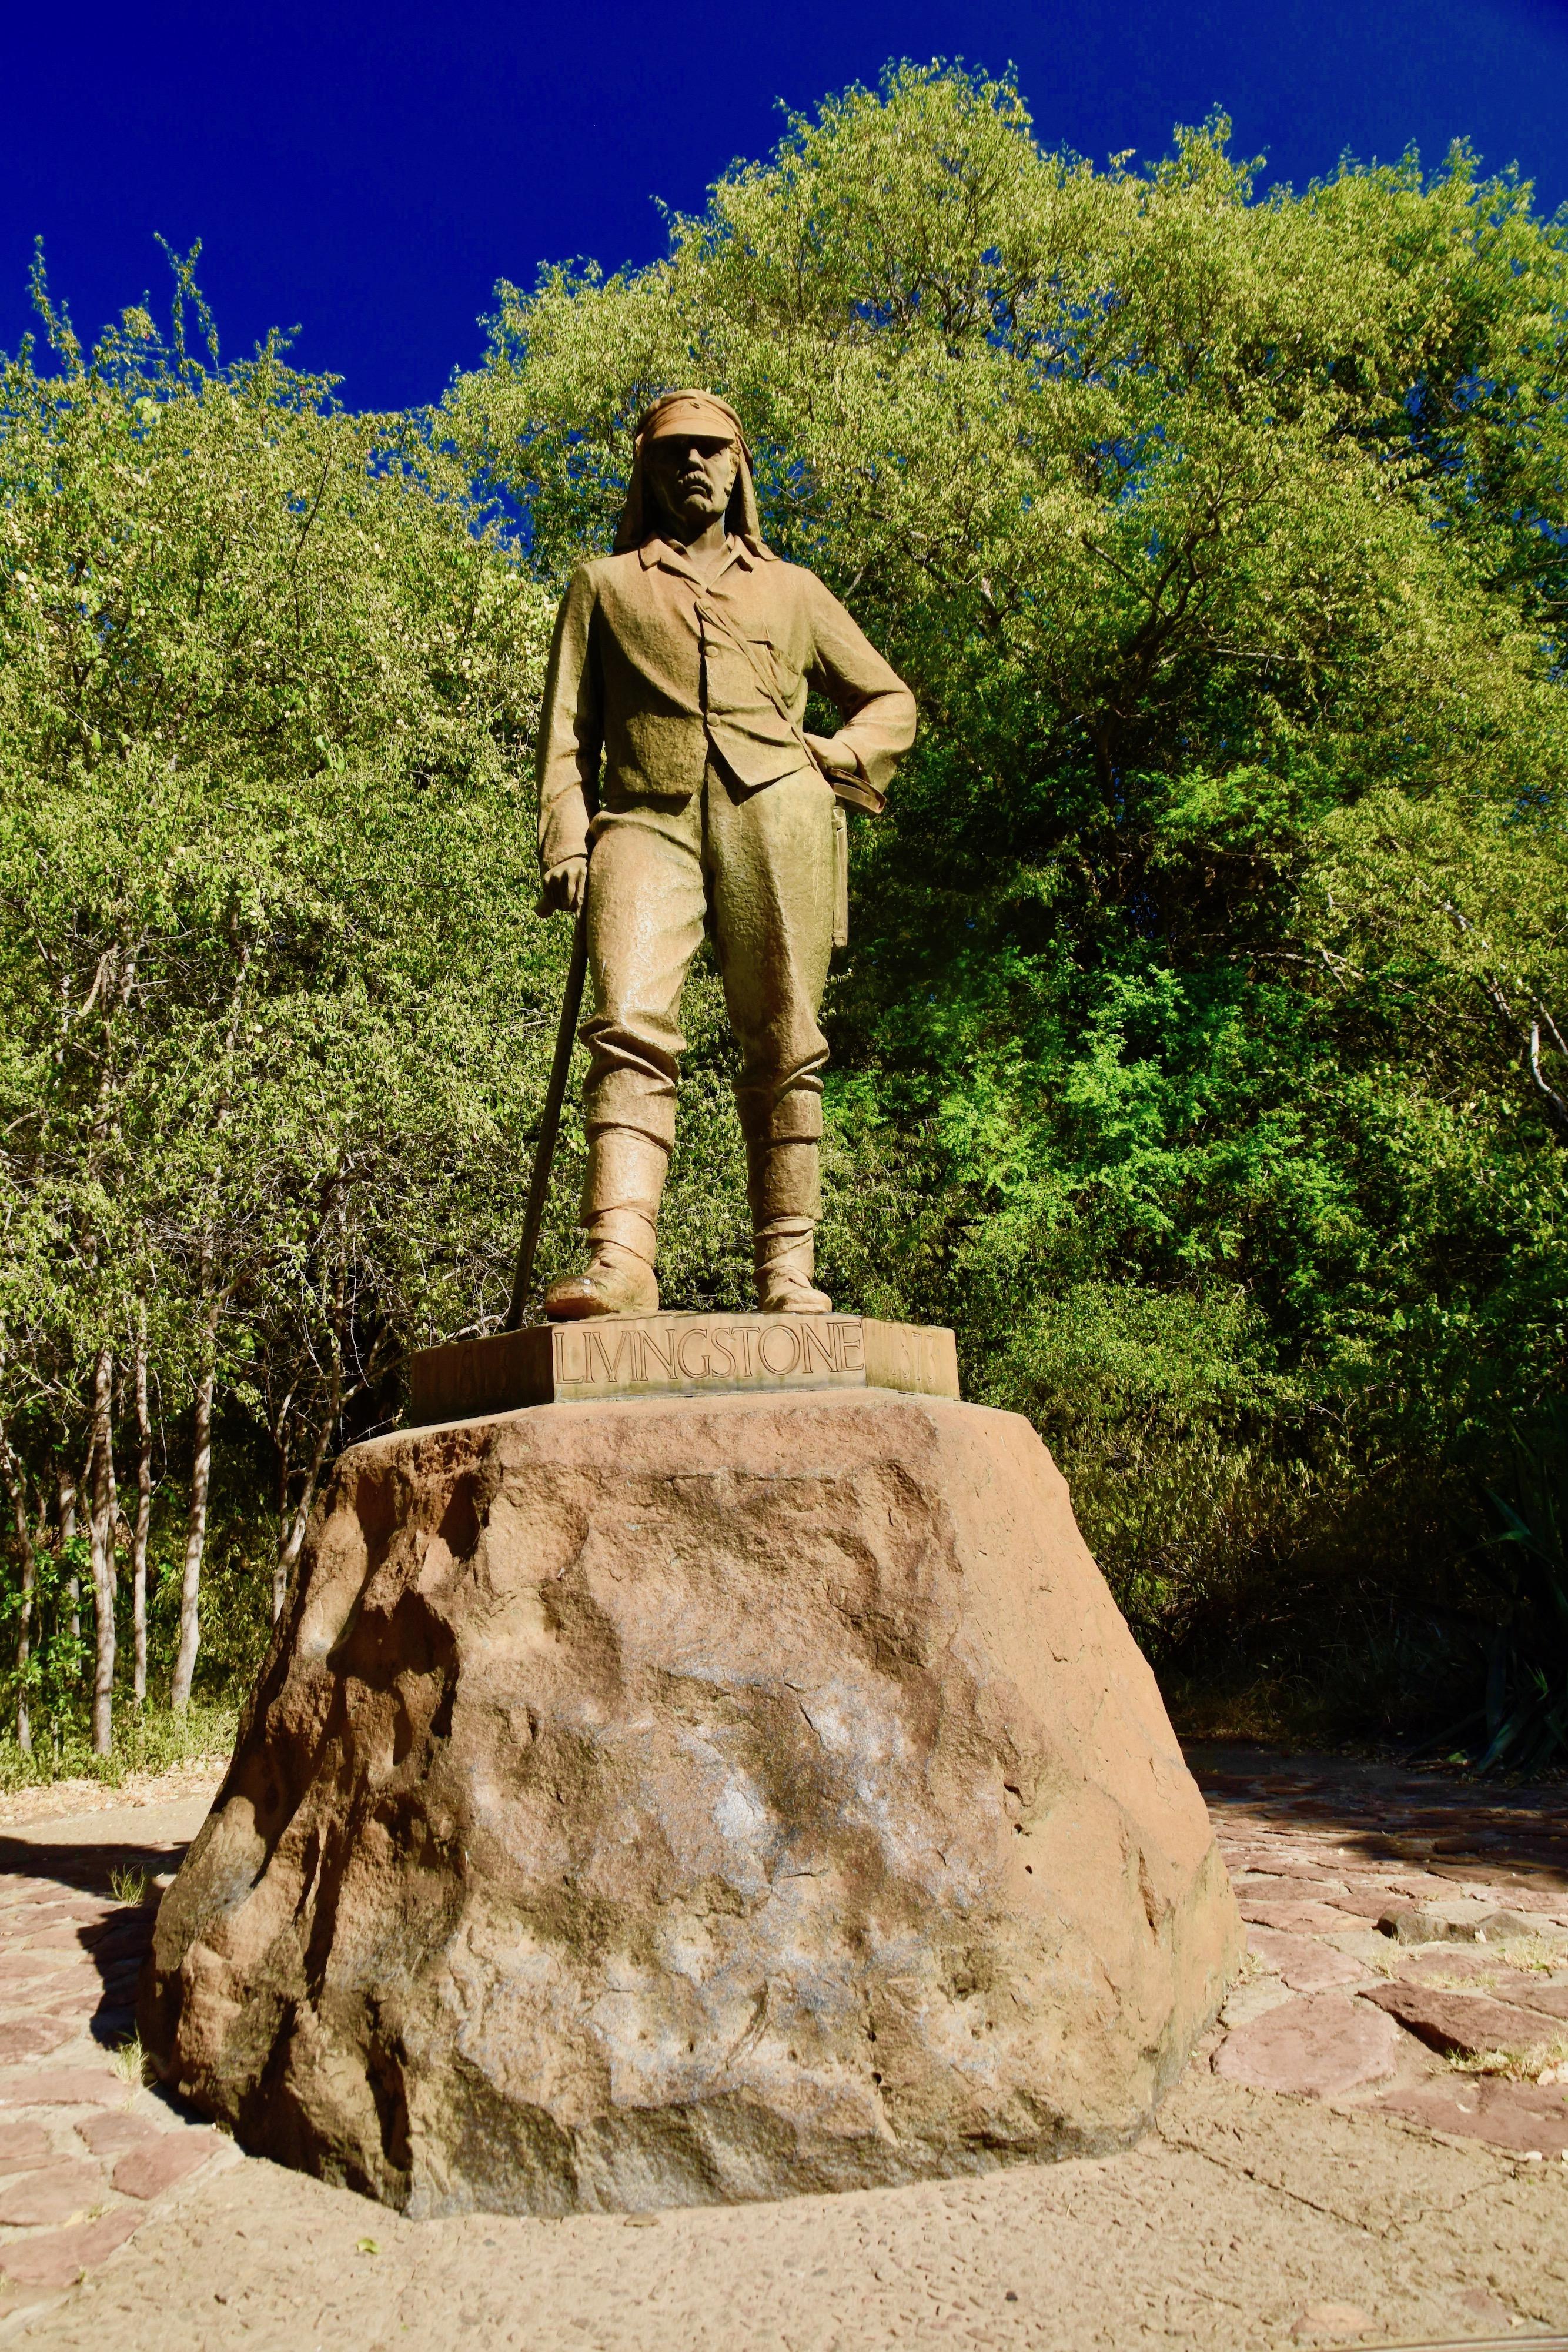 Statue of Livingstone at Victoria Falls